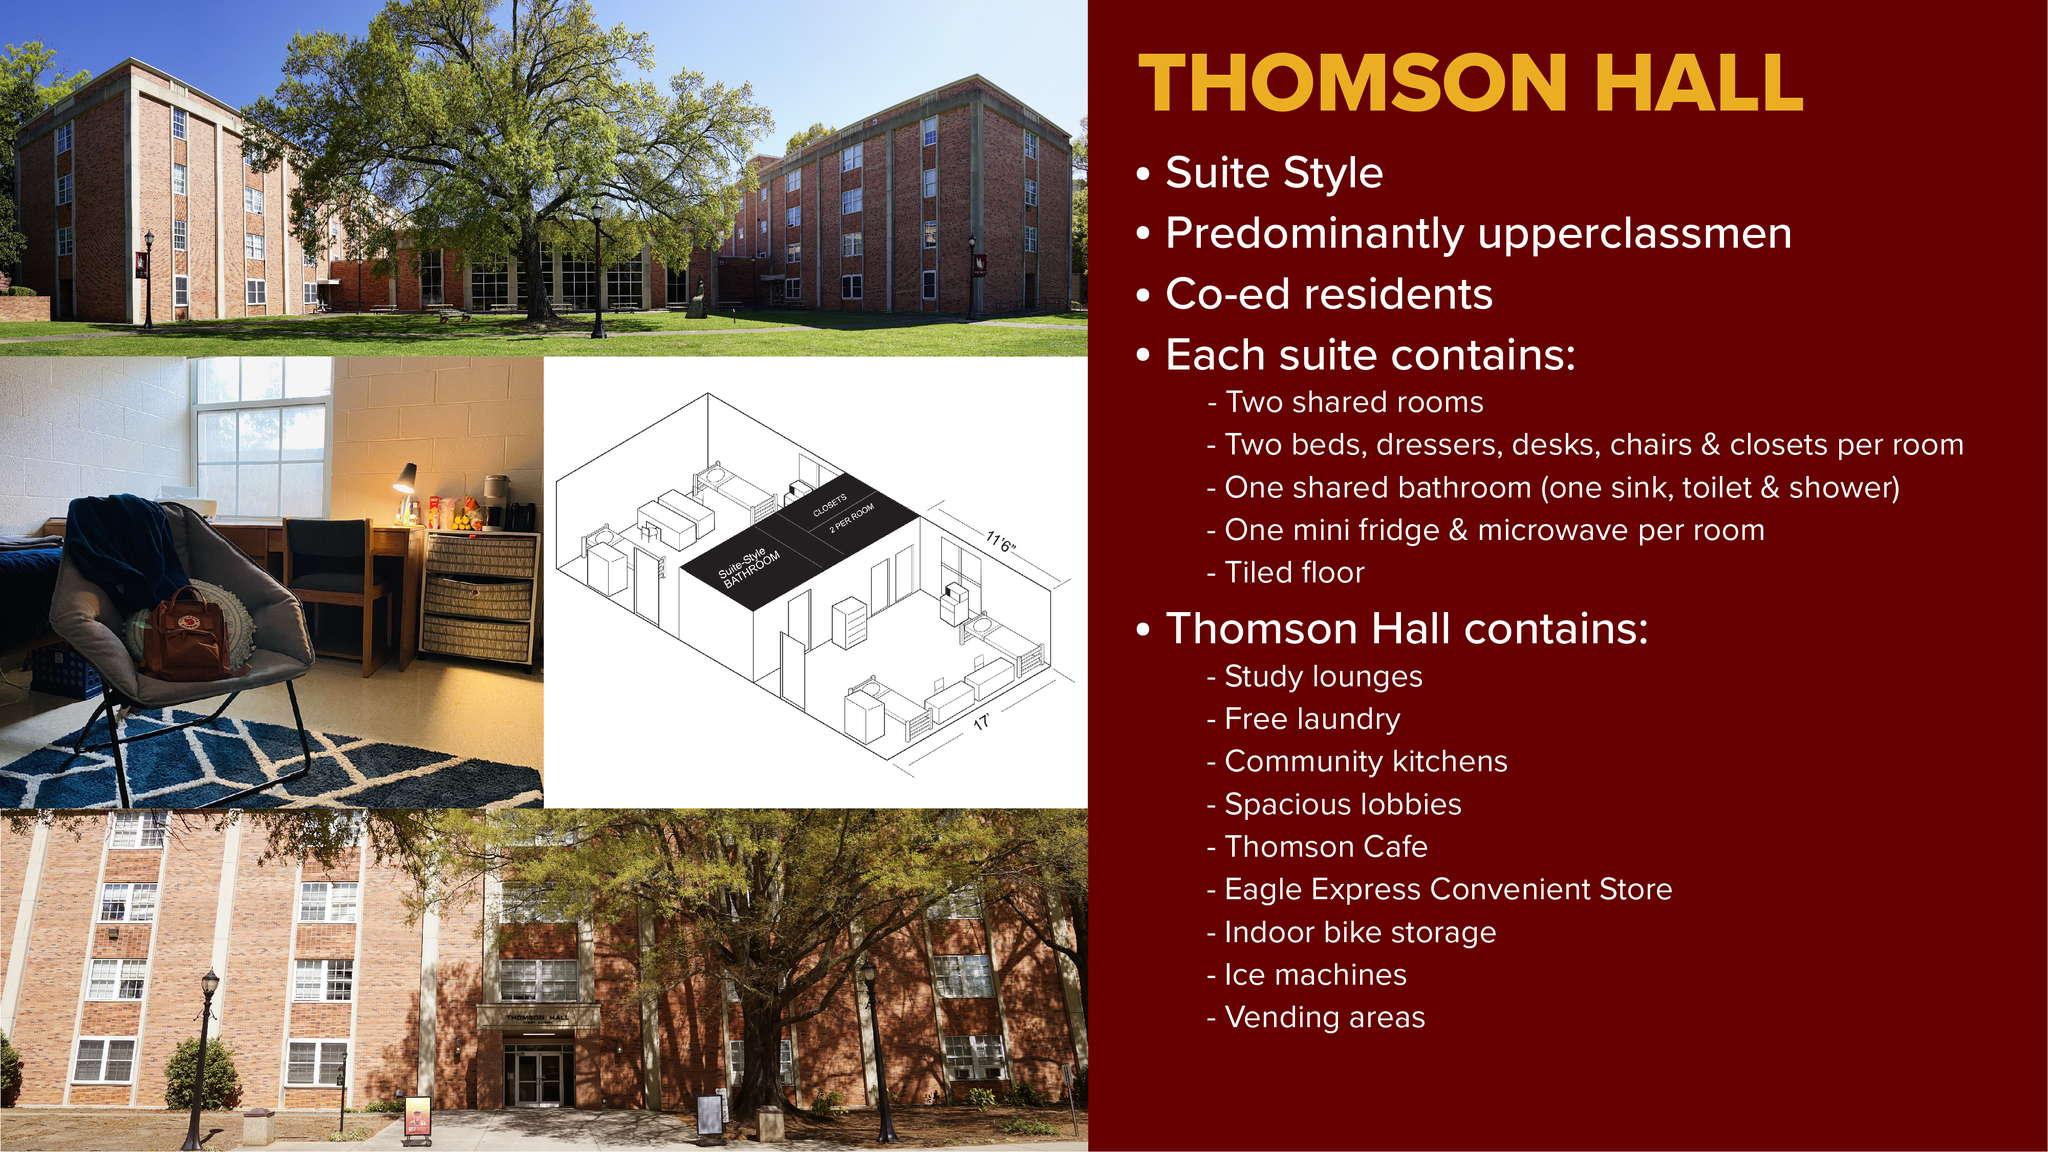 VWD_-_Residence_Hall_GFX_Thomson